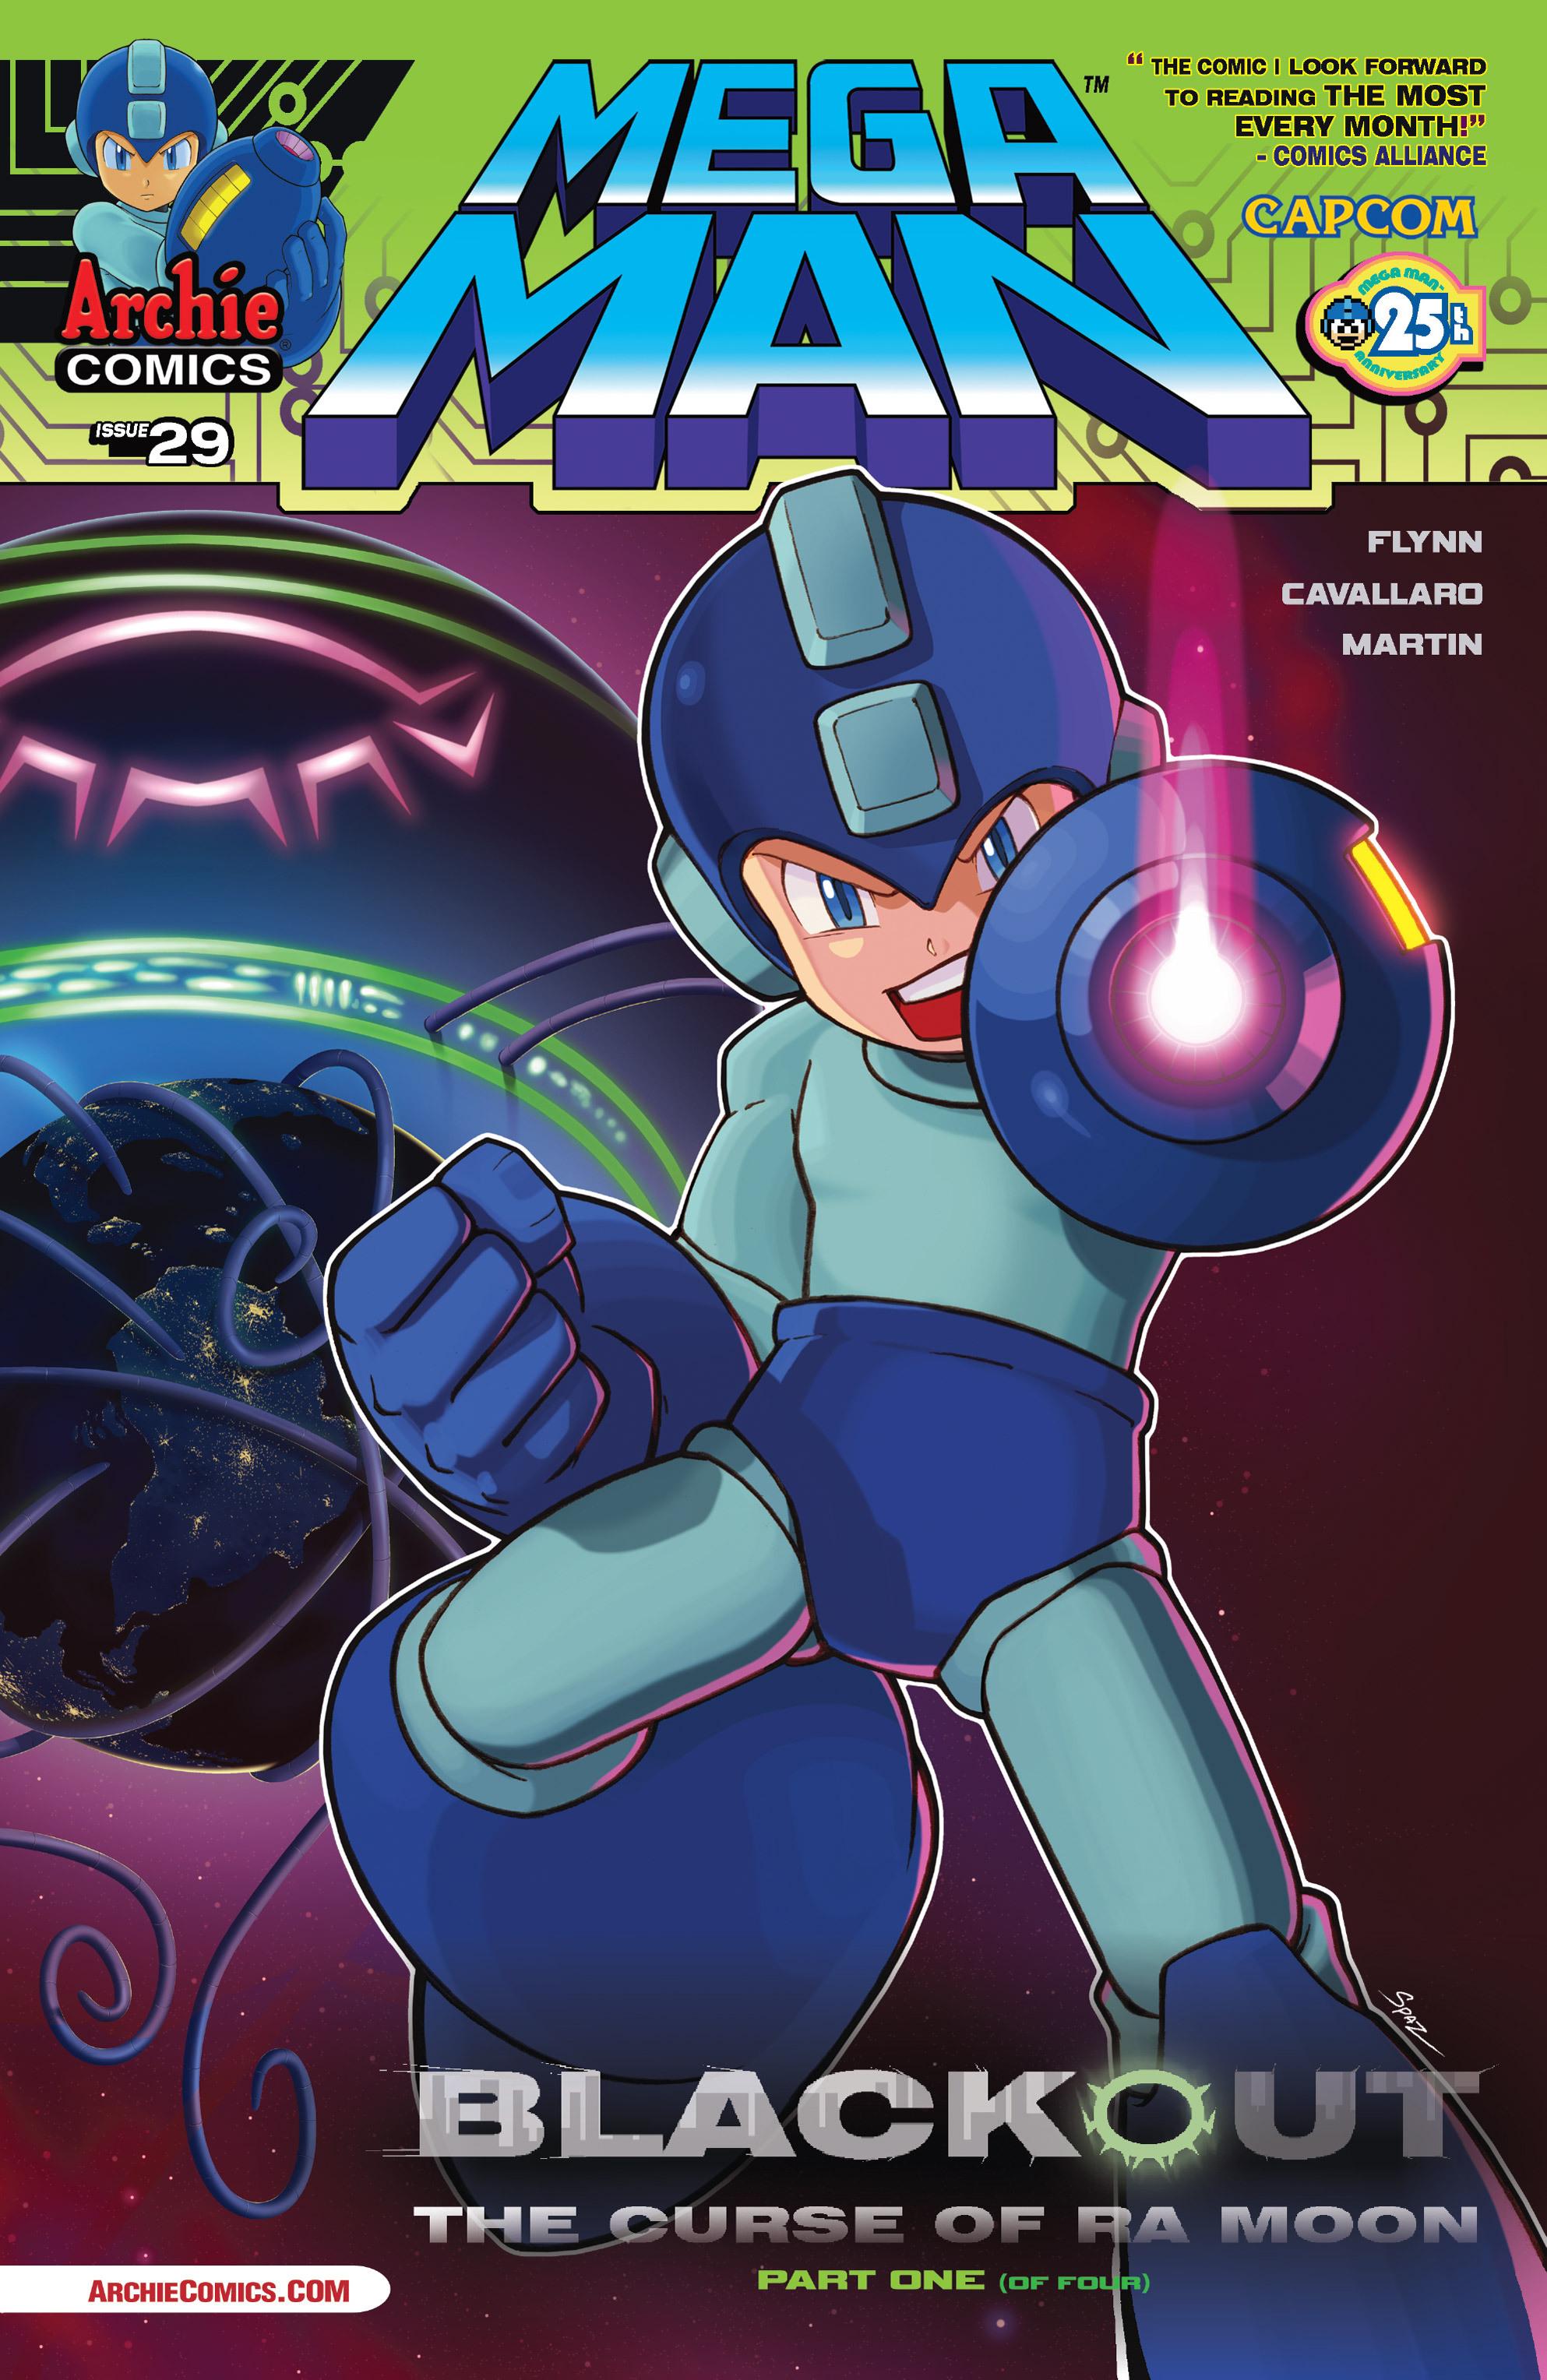 Mega Man Issue 35 (Archie Comics)   MMKB   FANDOM powered